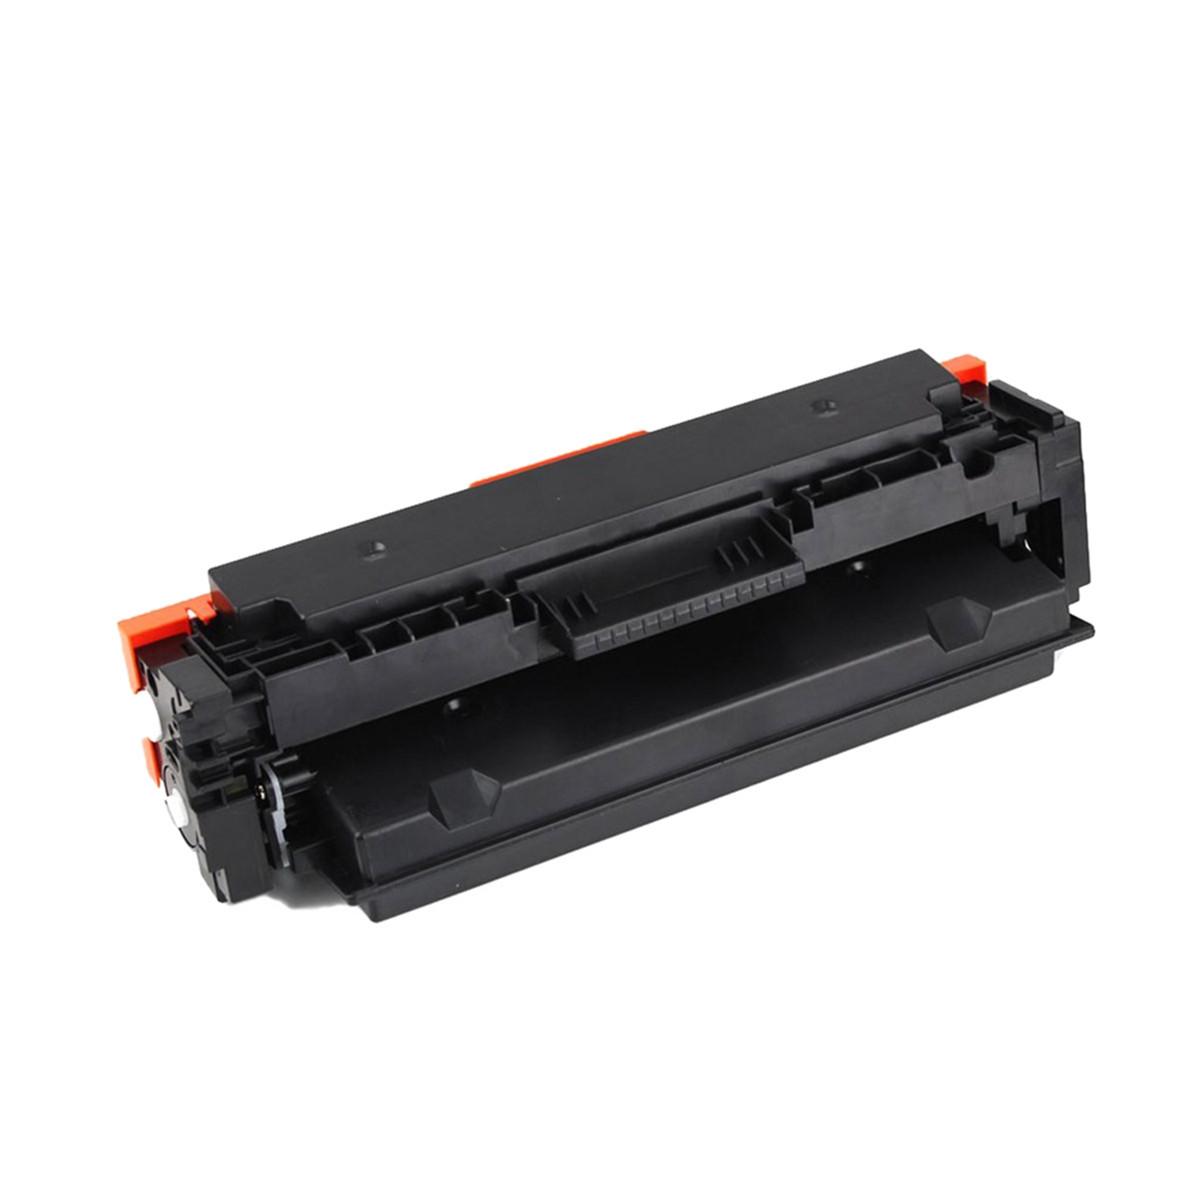 Toner Compatível com HP CF410A Preto | M452DW M452DN M477FDW M477FNW M477FDN | Premium Quality 2.3k